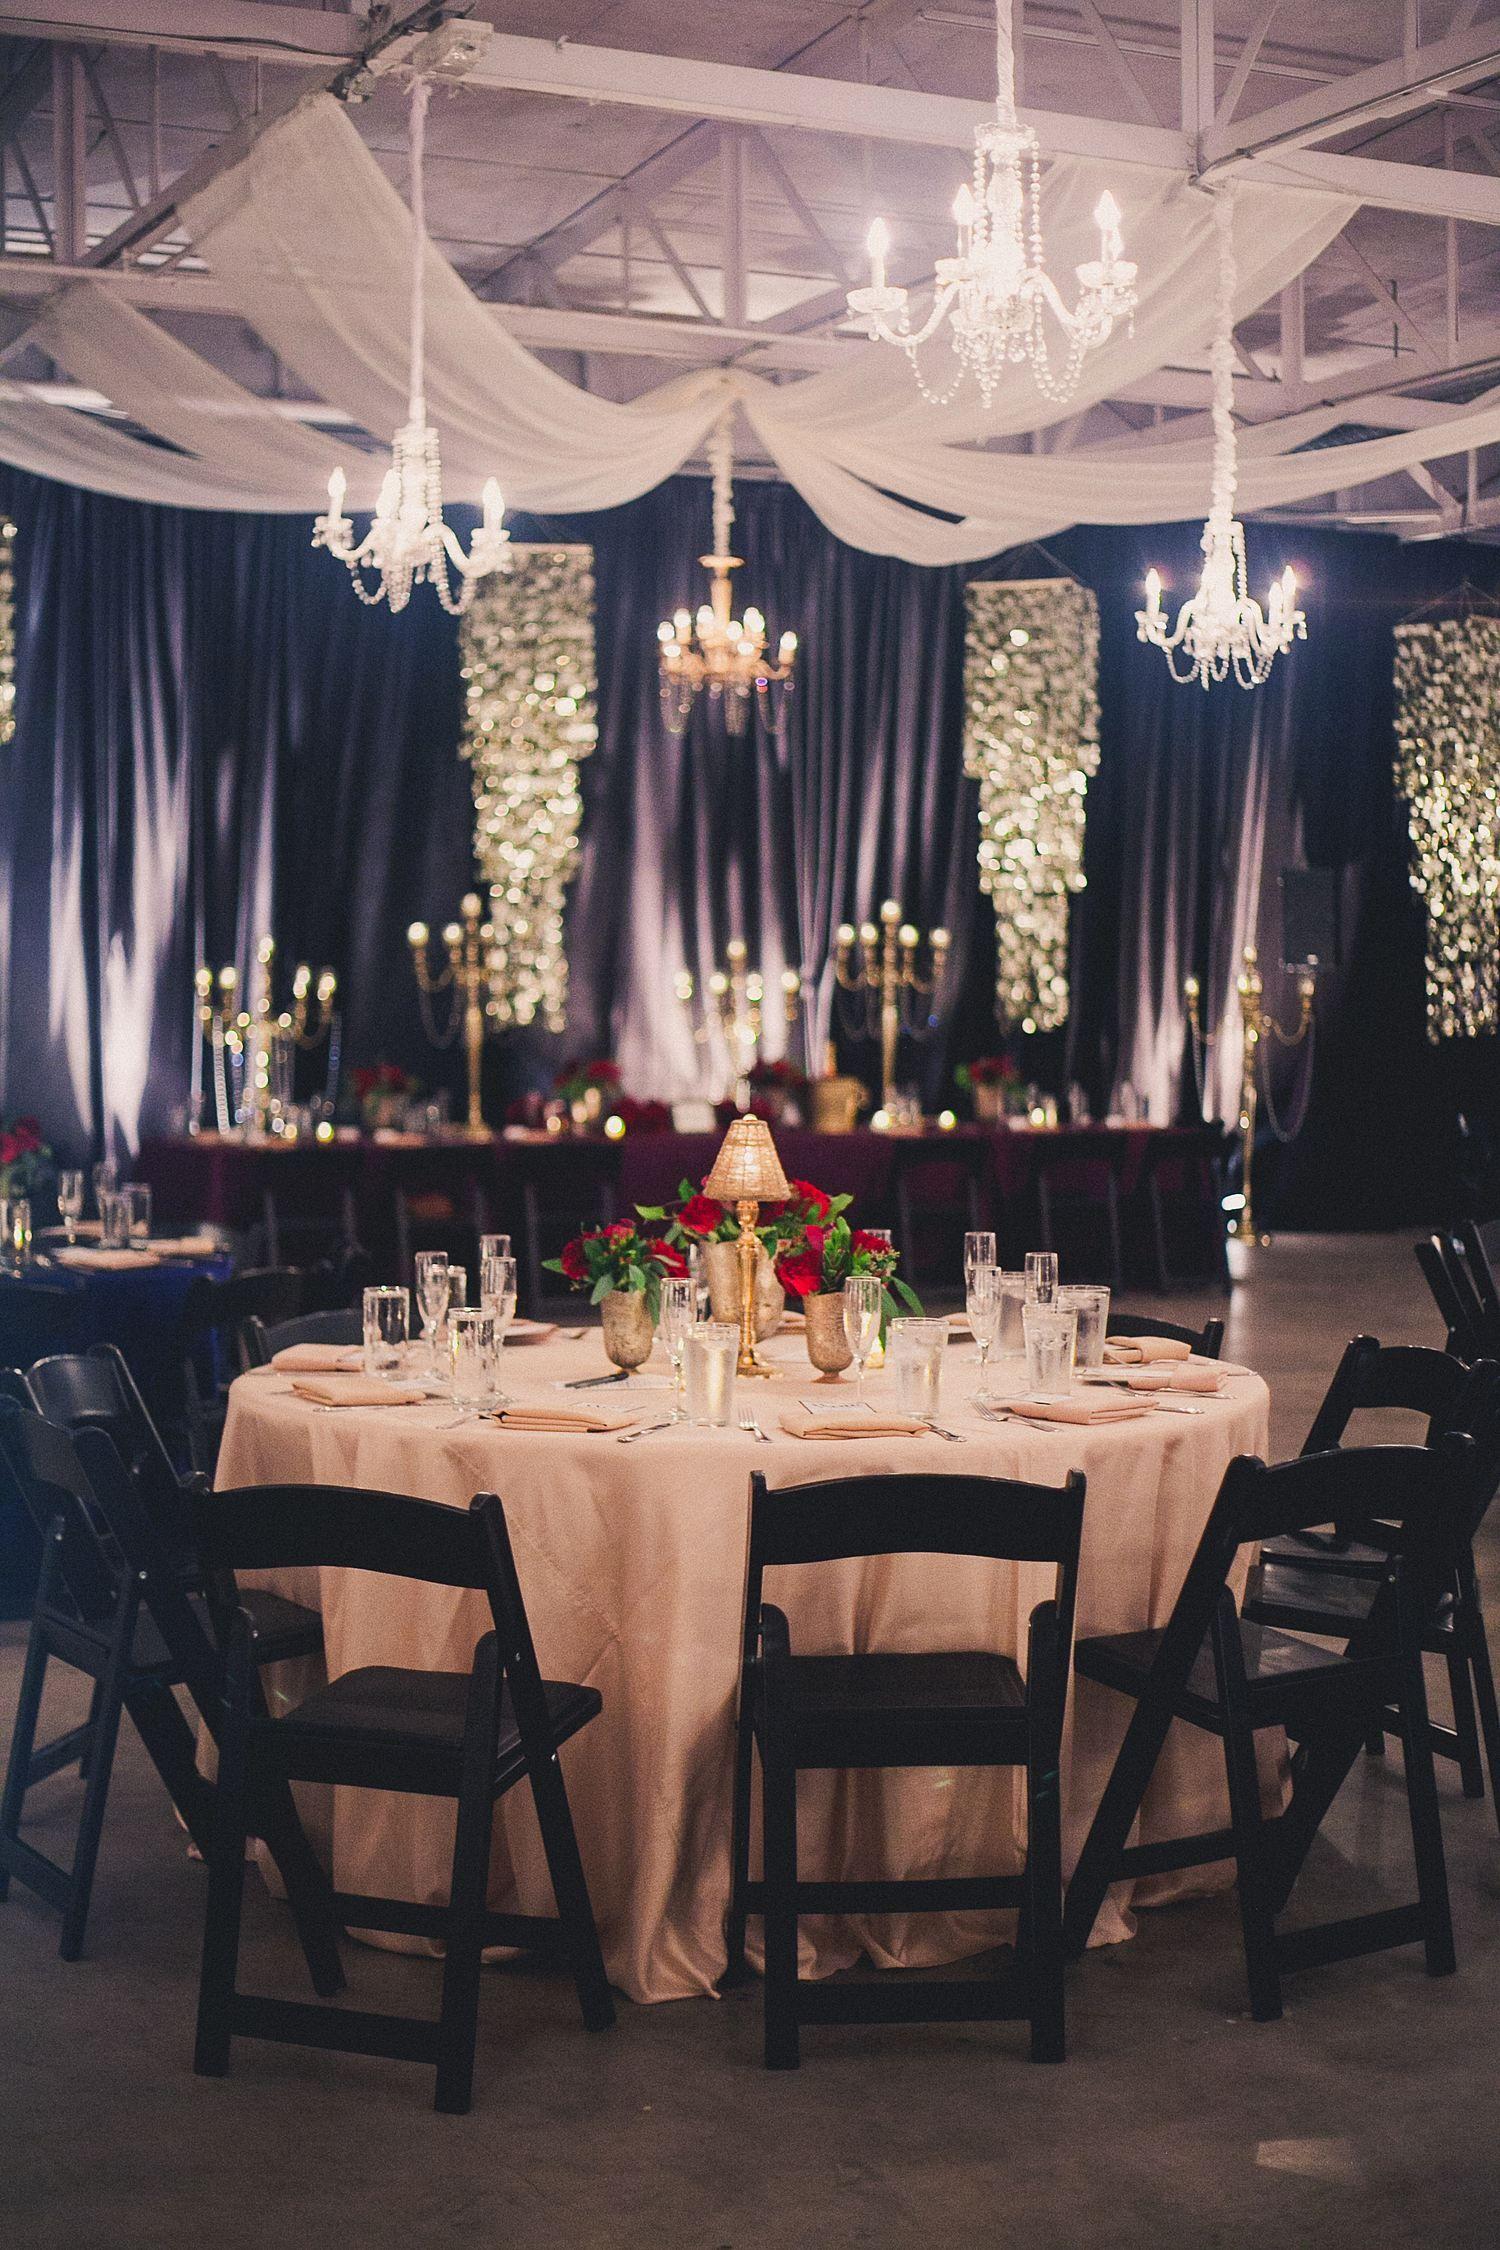 The Croft Downtown Weddings